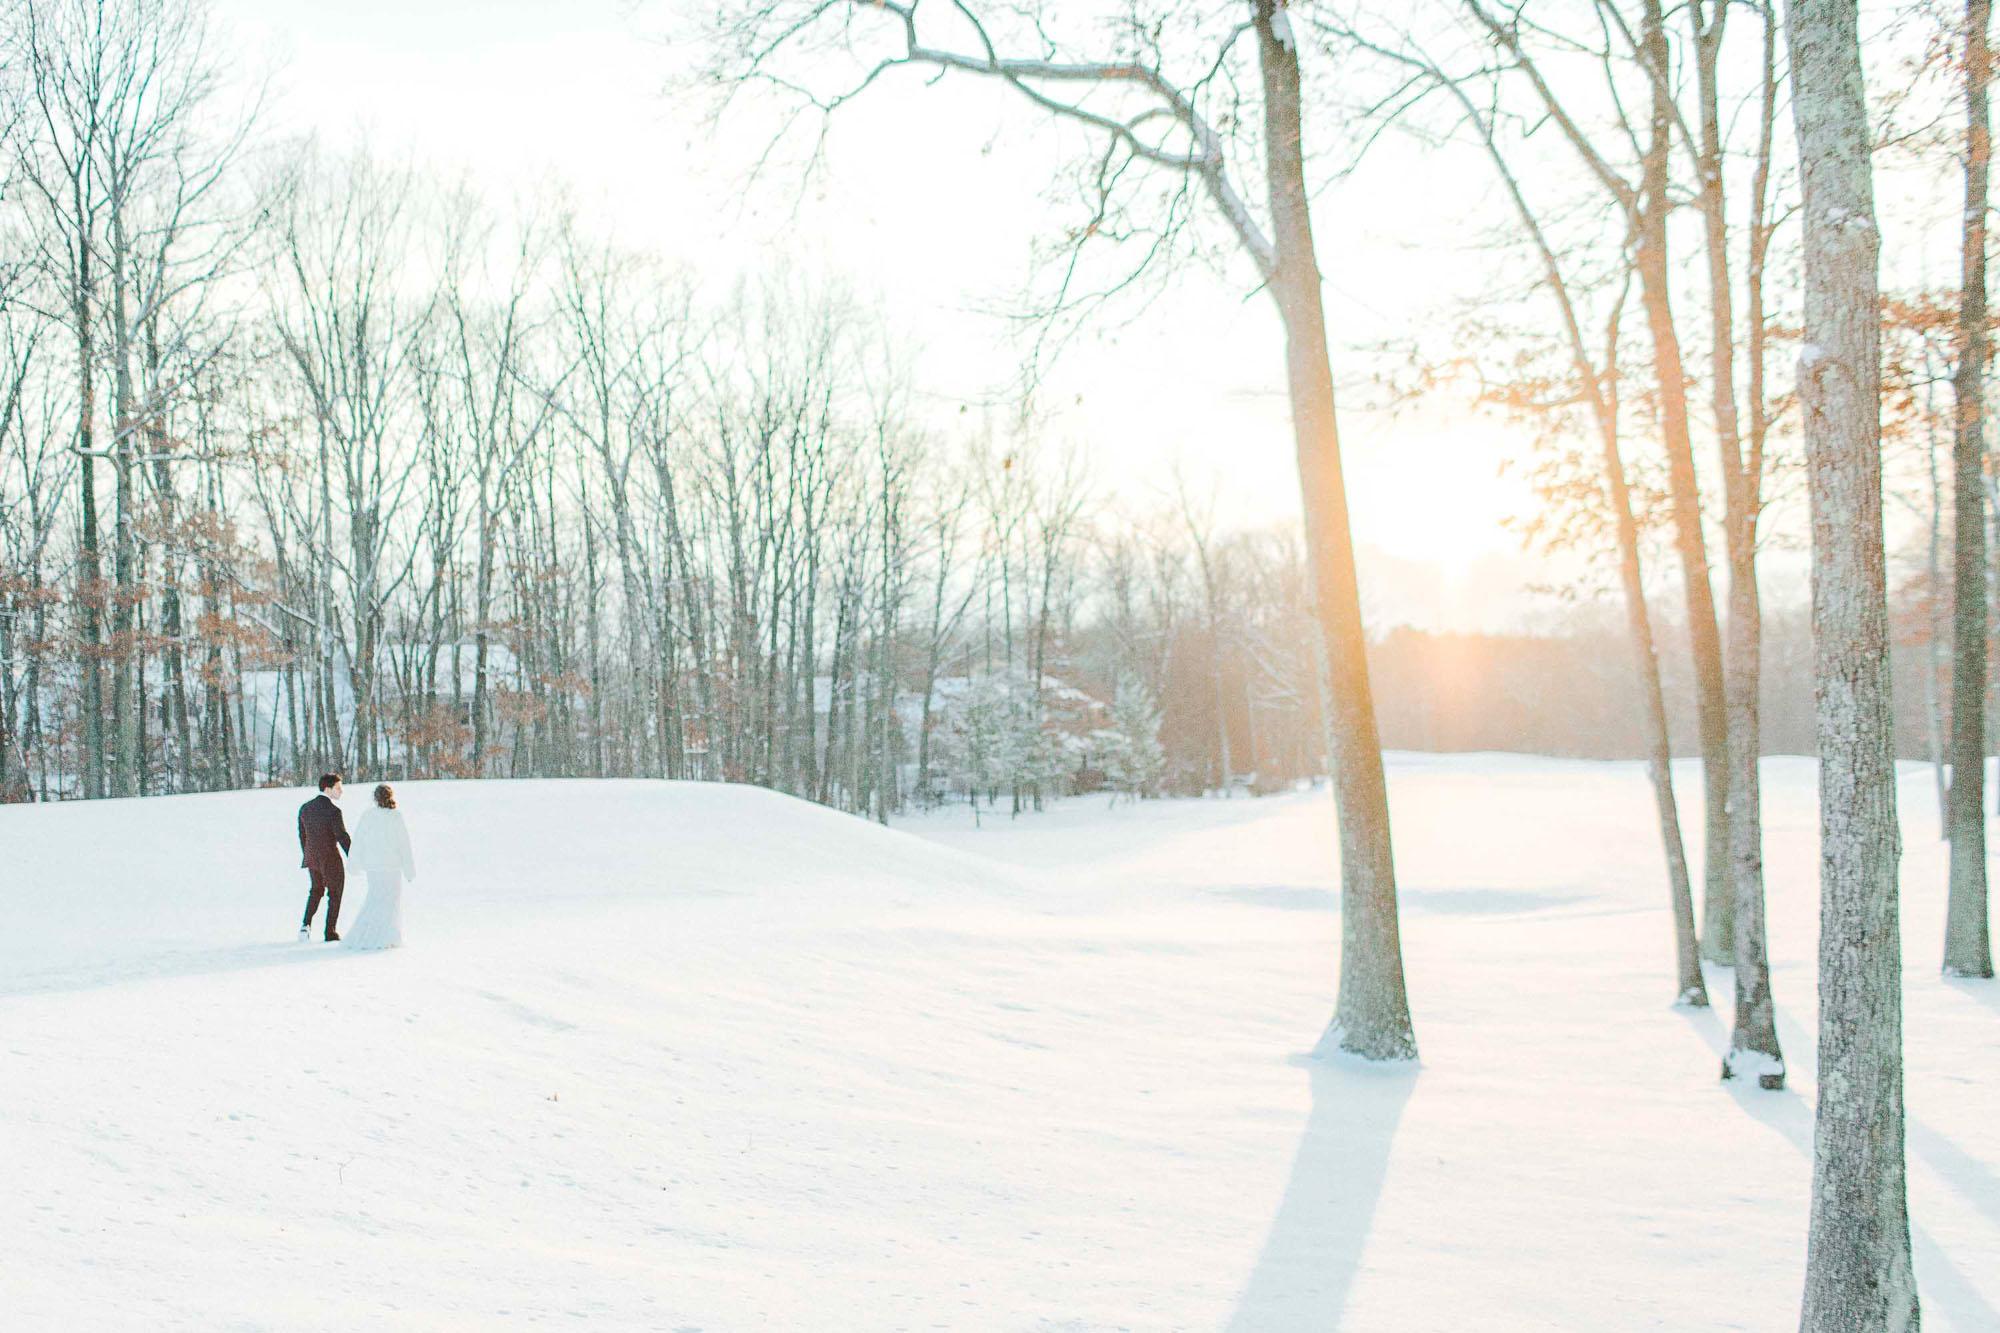 snowy-sand-springs-country-club-drums-pa-christmas-wedding-34911.jpg